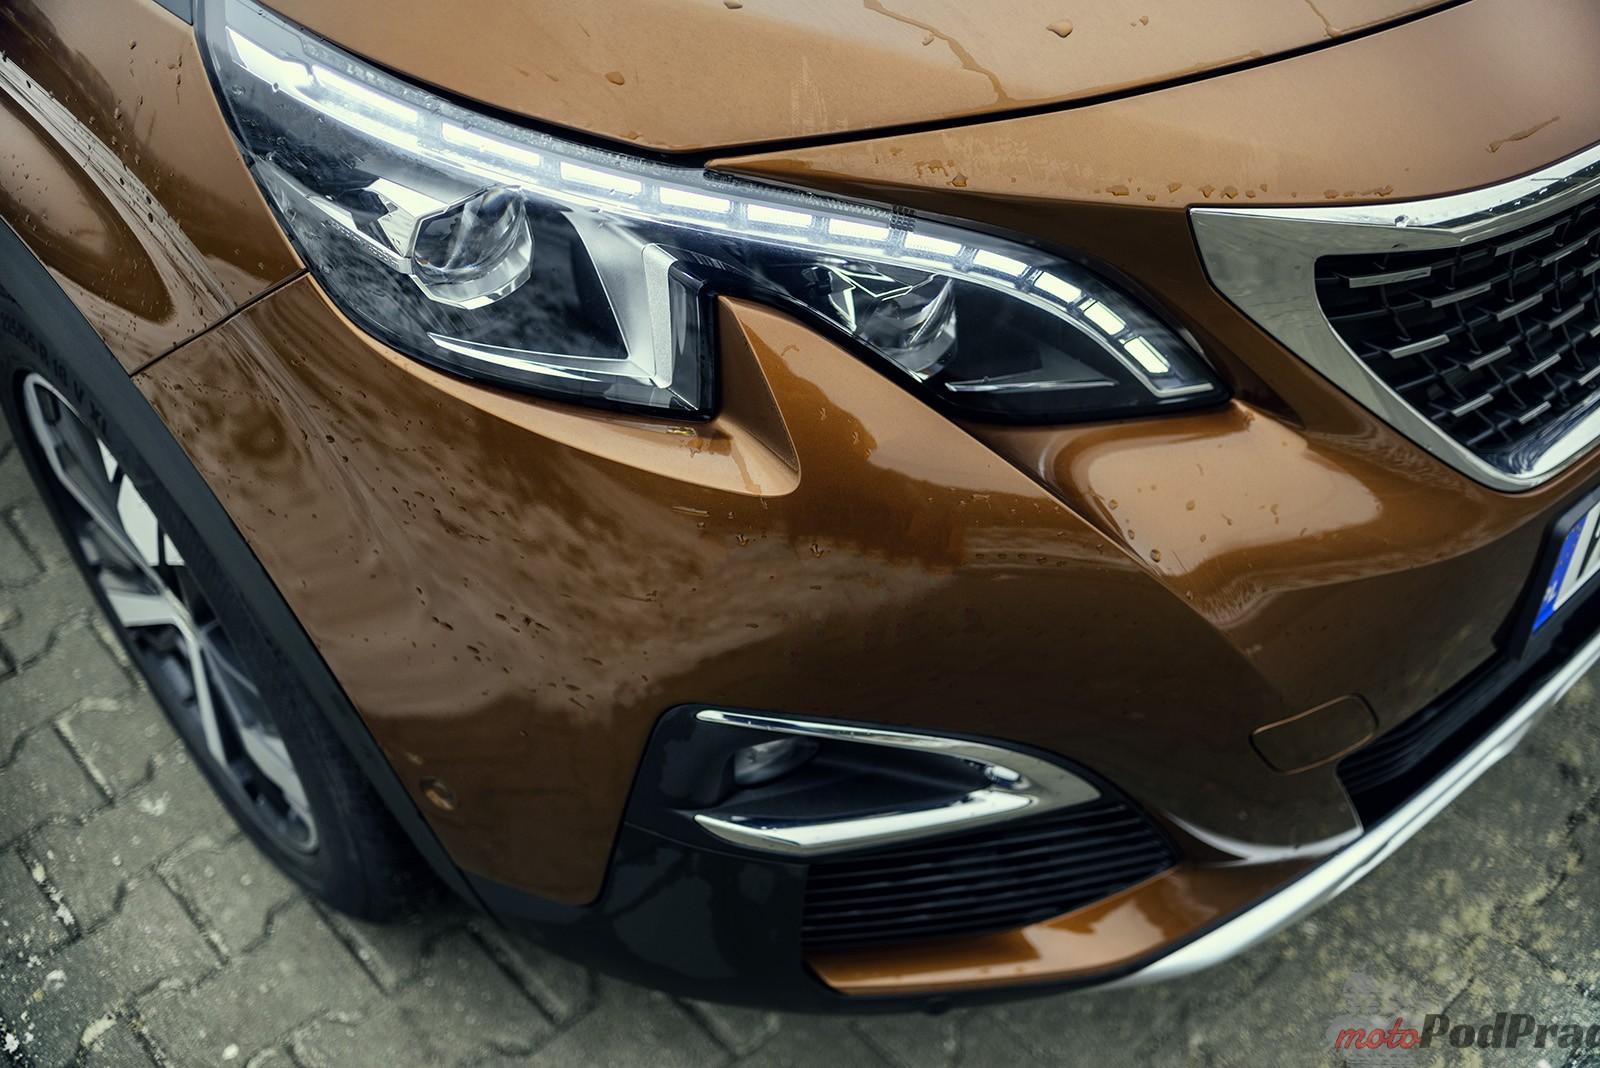 Peugeot 3008 8 Test: Peugeot 3008 1.6 THP   wirtualny lew